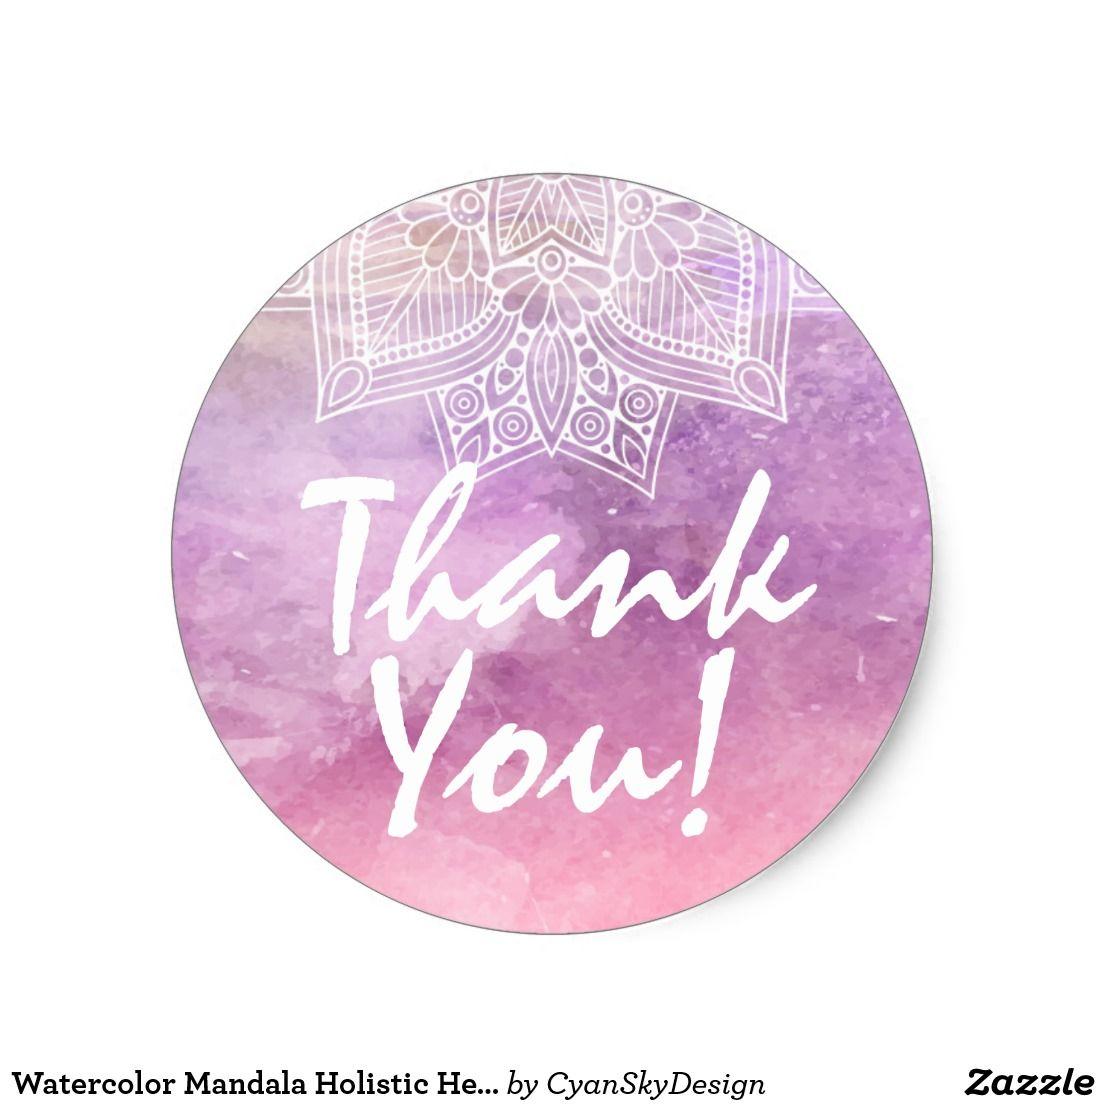 Watercolor mandala holistic healing thank you classic round sticker by cyanskydesign on zazzle • thankyou packaging marketing mandala